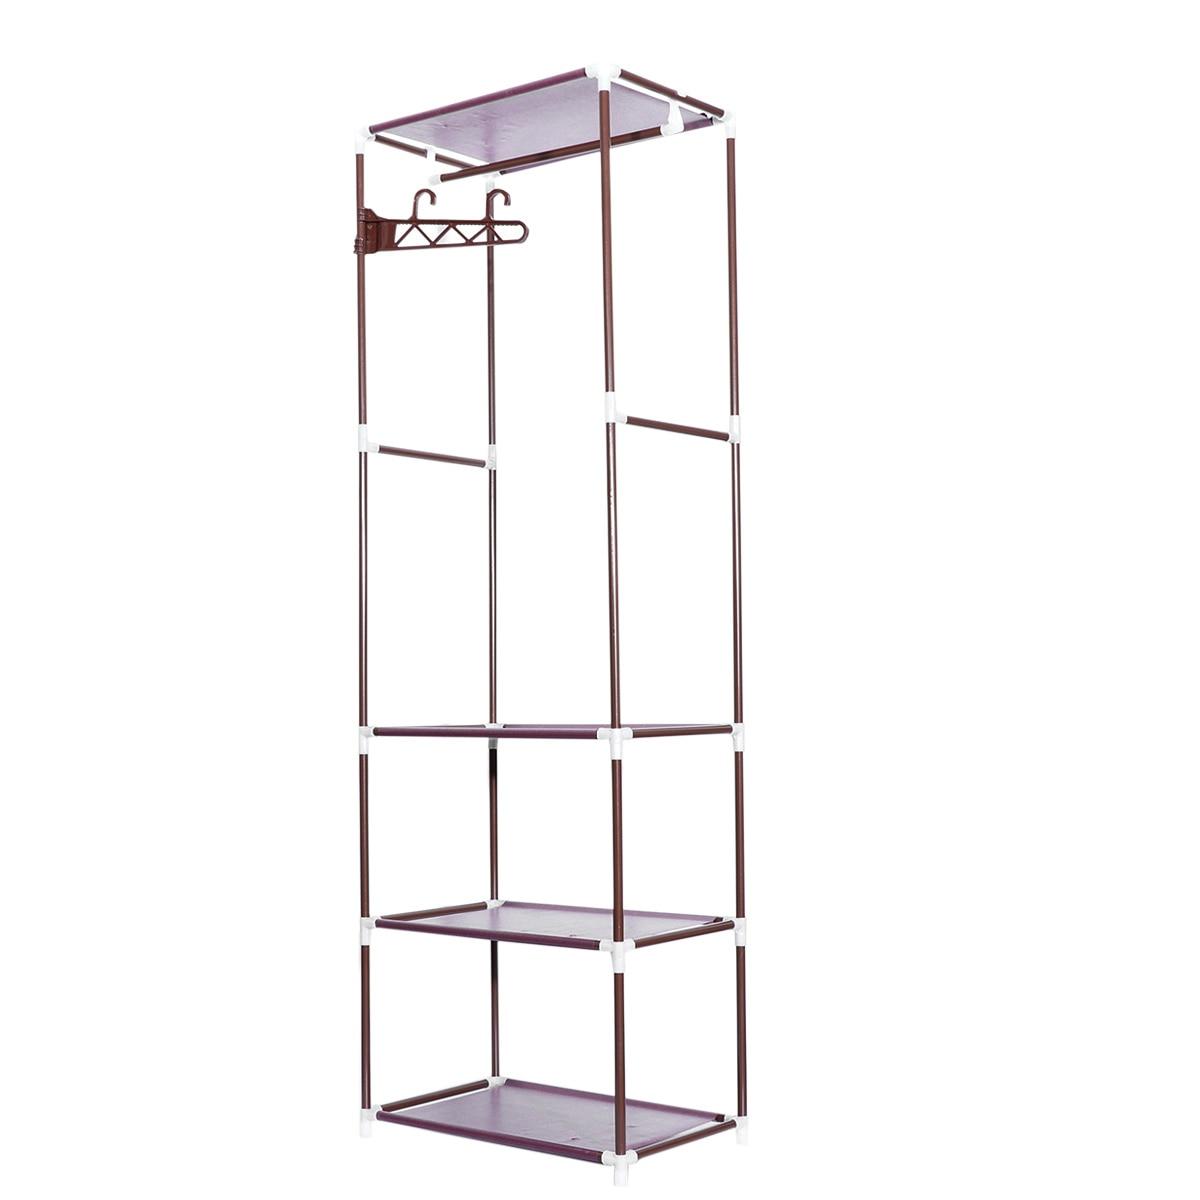 Bathroom Fixtures Bathroom Shelves 1pcs Portable Clothes Rack Organizer Bedroom Garment Floor-standing Shelf Clothing Coat Rack Storage Stand